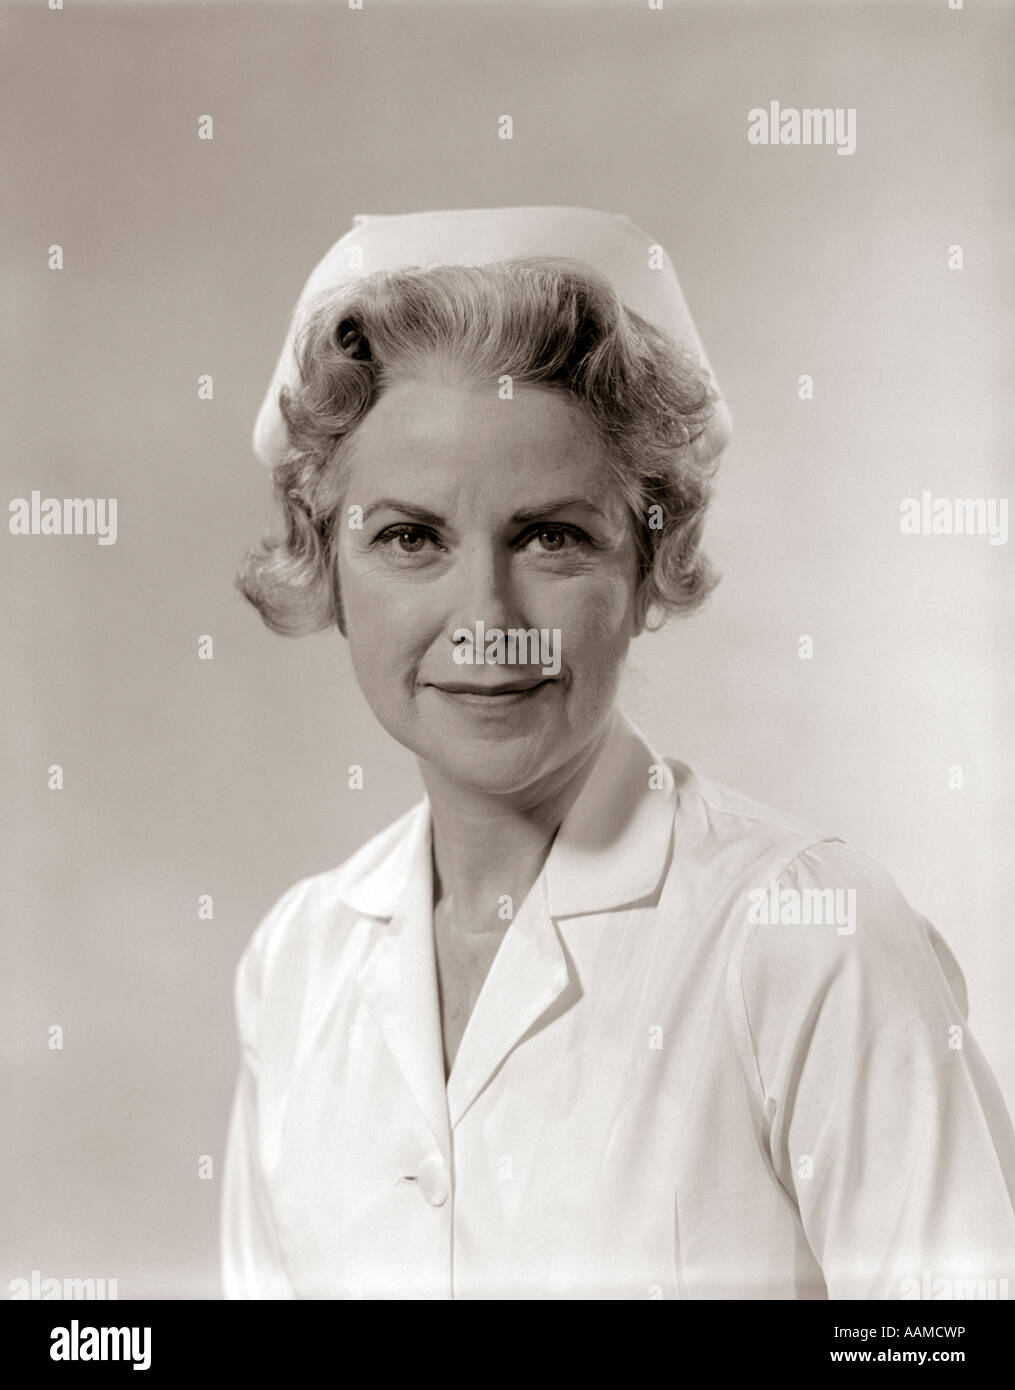 Nurse Uniform 1960 S Stock Photos Amp Nurse Uniform 1960 S